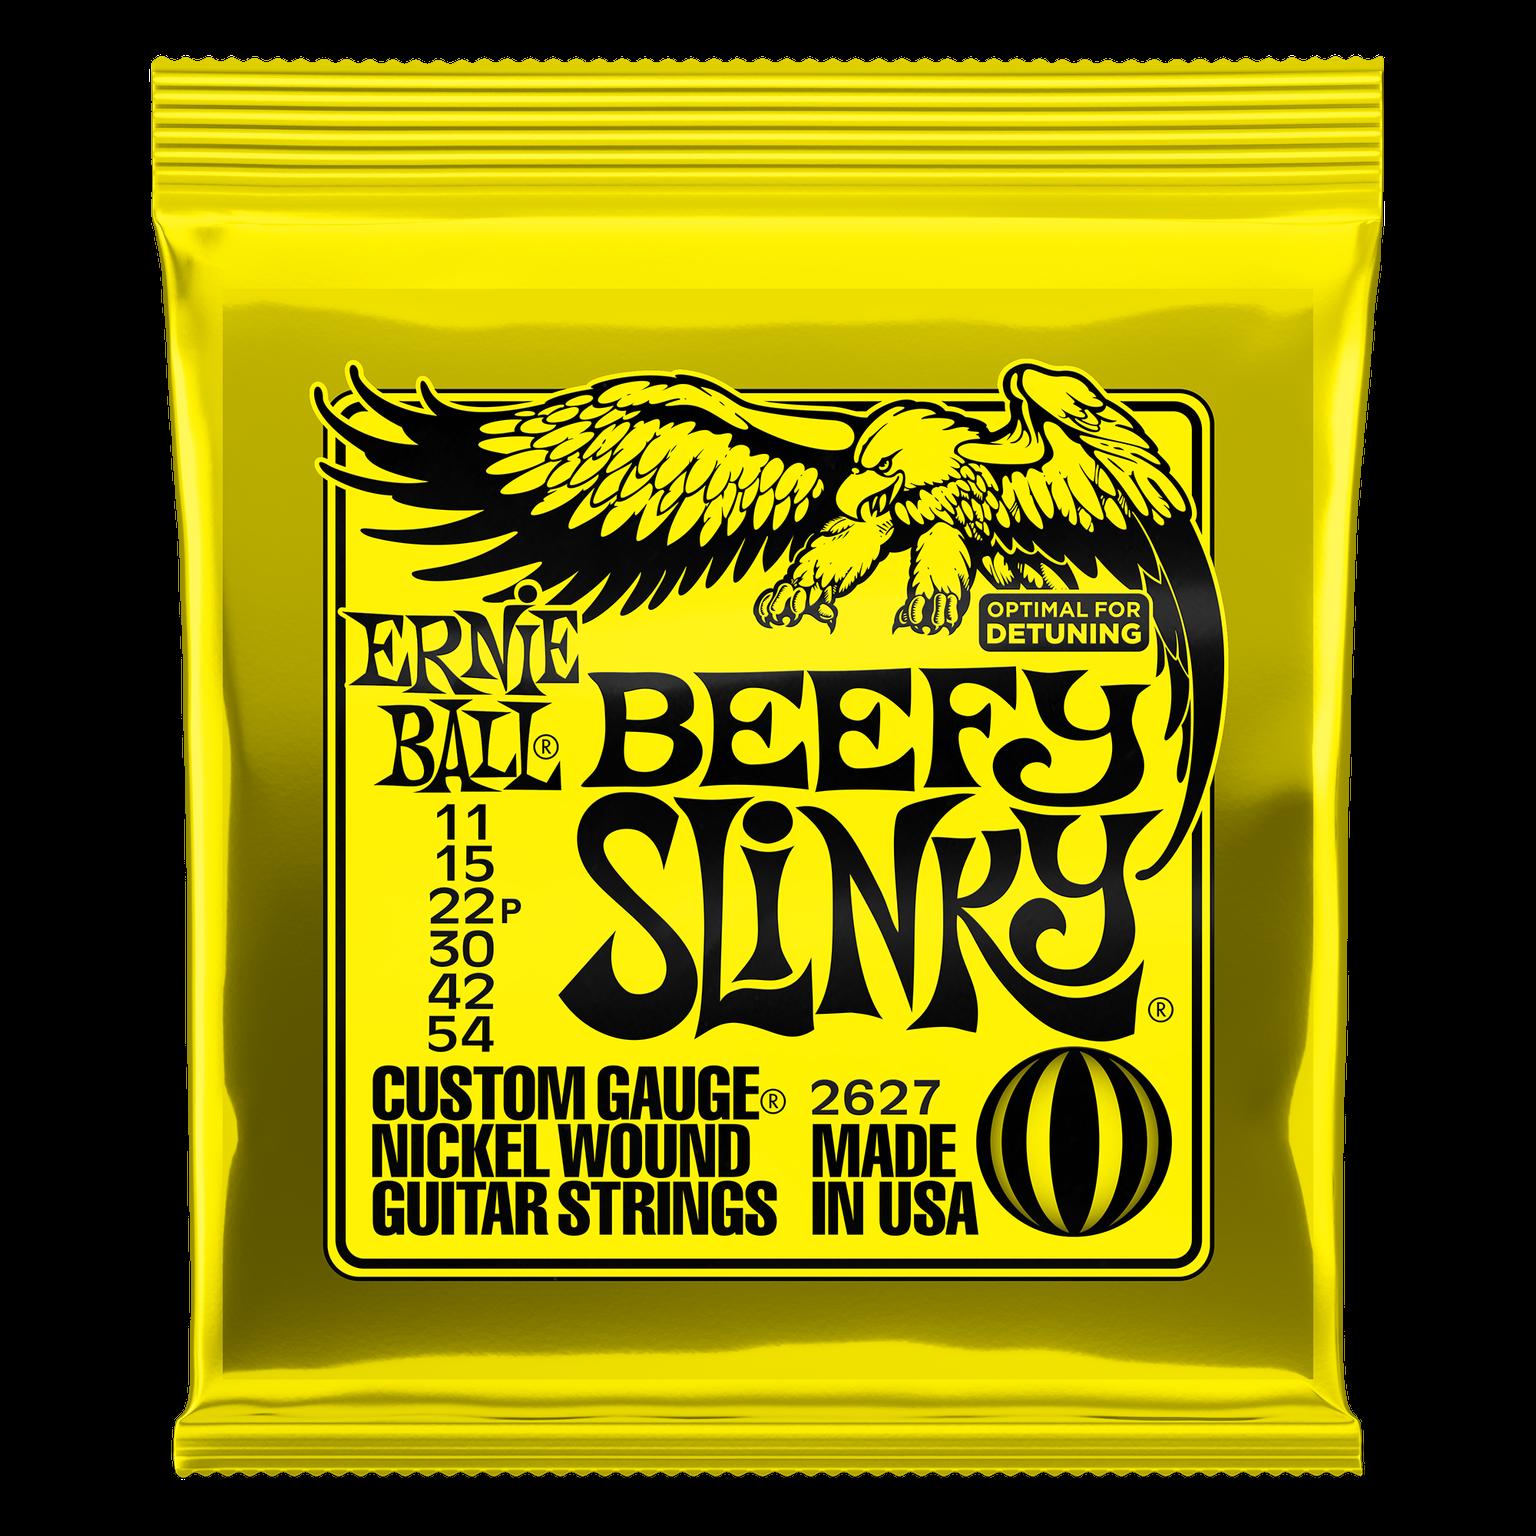 Ernie Ball Beefy Slinky Strings